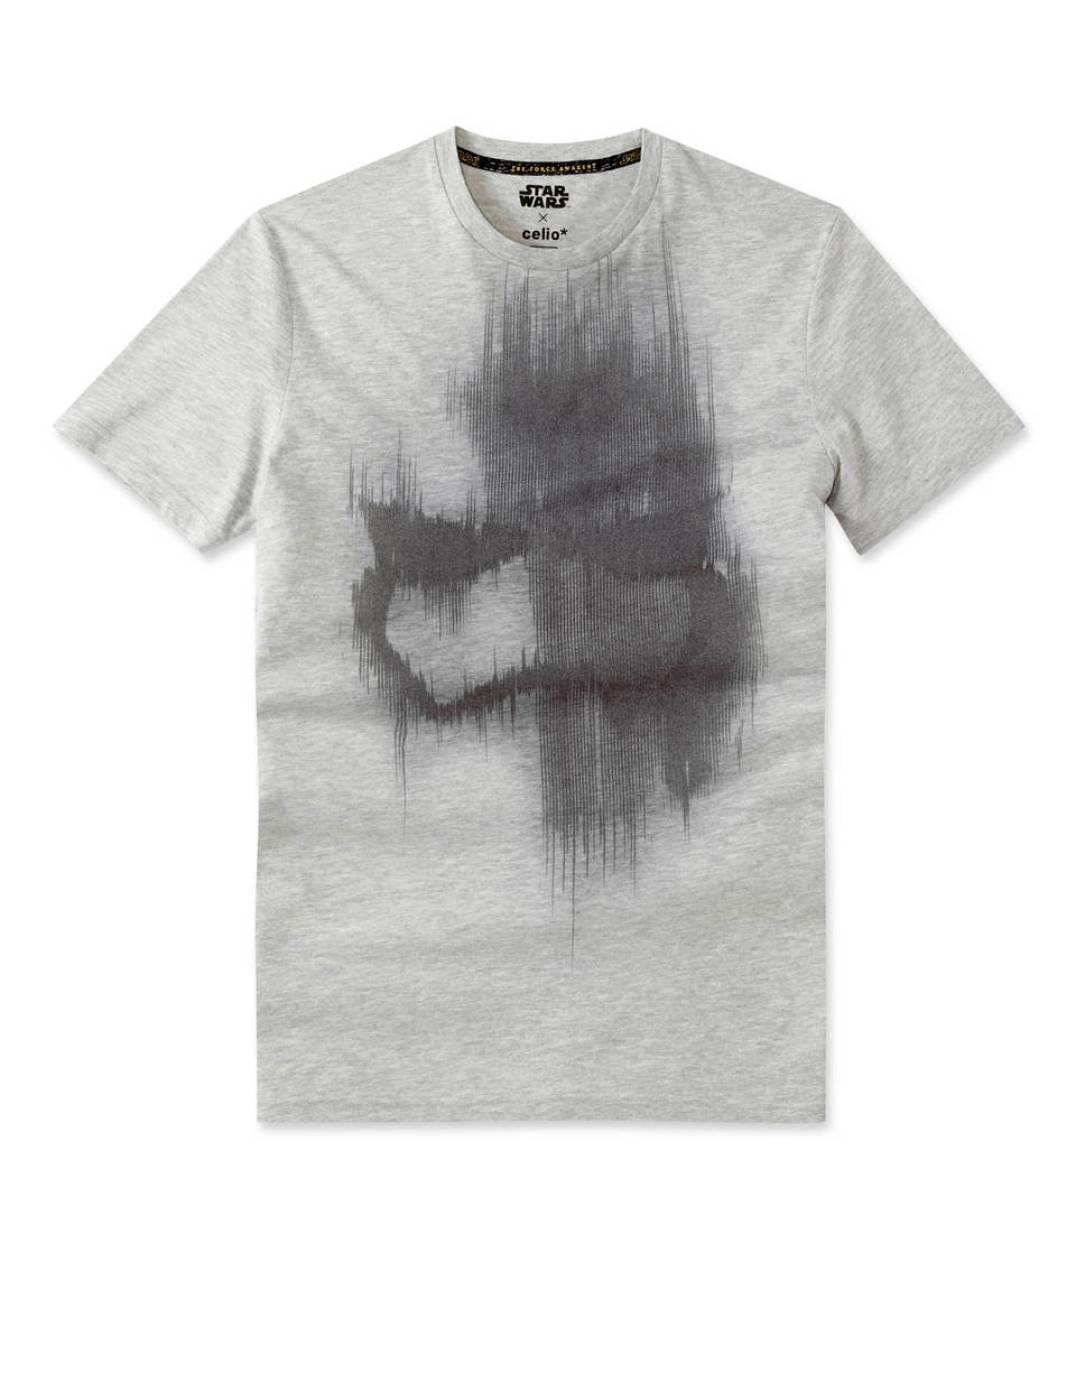 T shirt homme Star Wars Stormtrooper - Celio - Charonbelli's blog mode